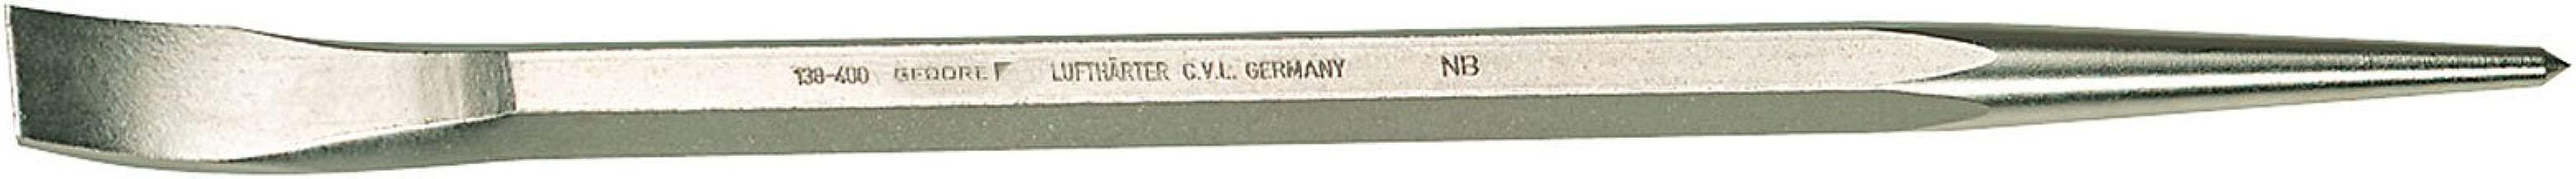 Palanqueta 1000 mm Gedore 123-1000